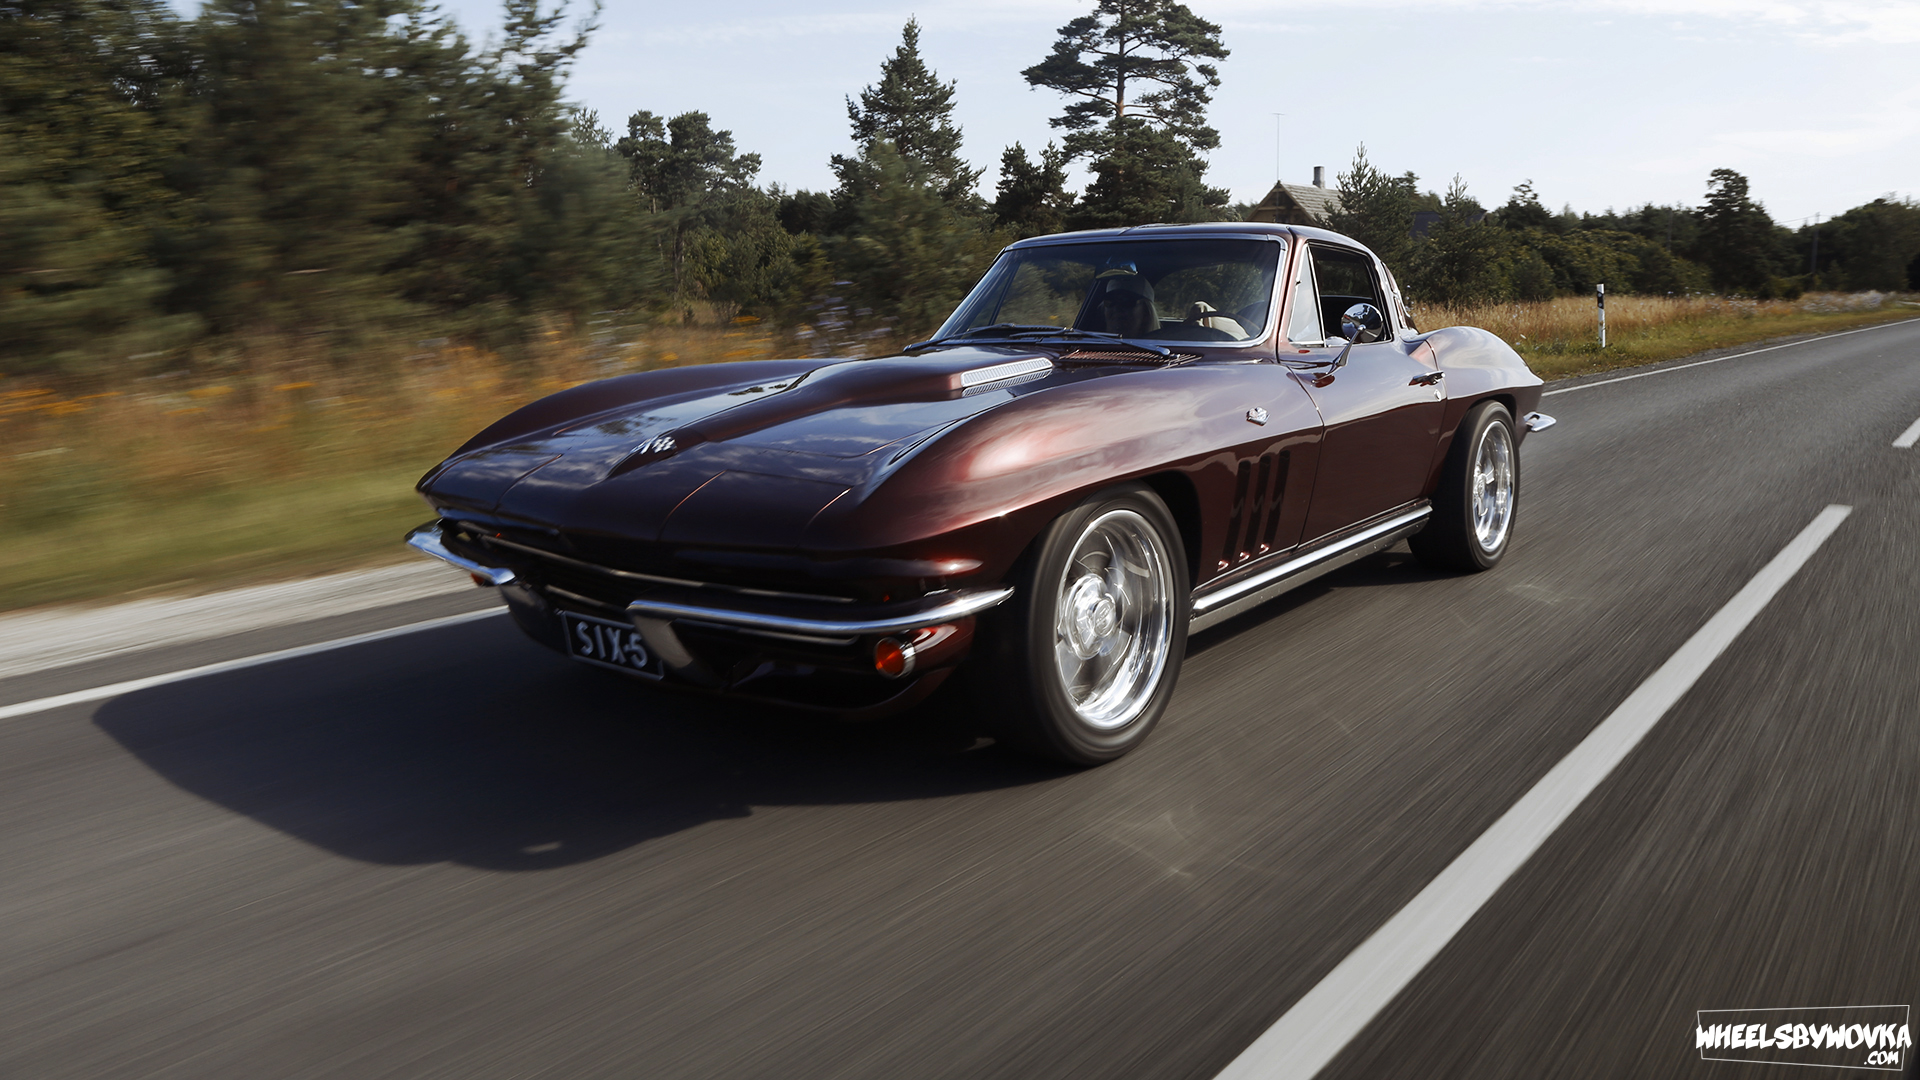 Meet The Worlds Fastest 1965 C2 corvette